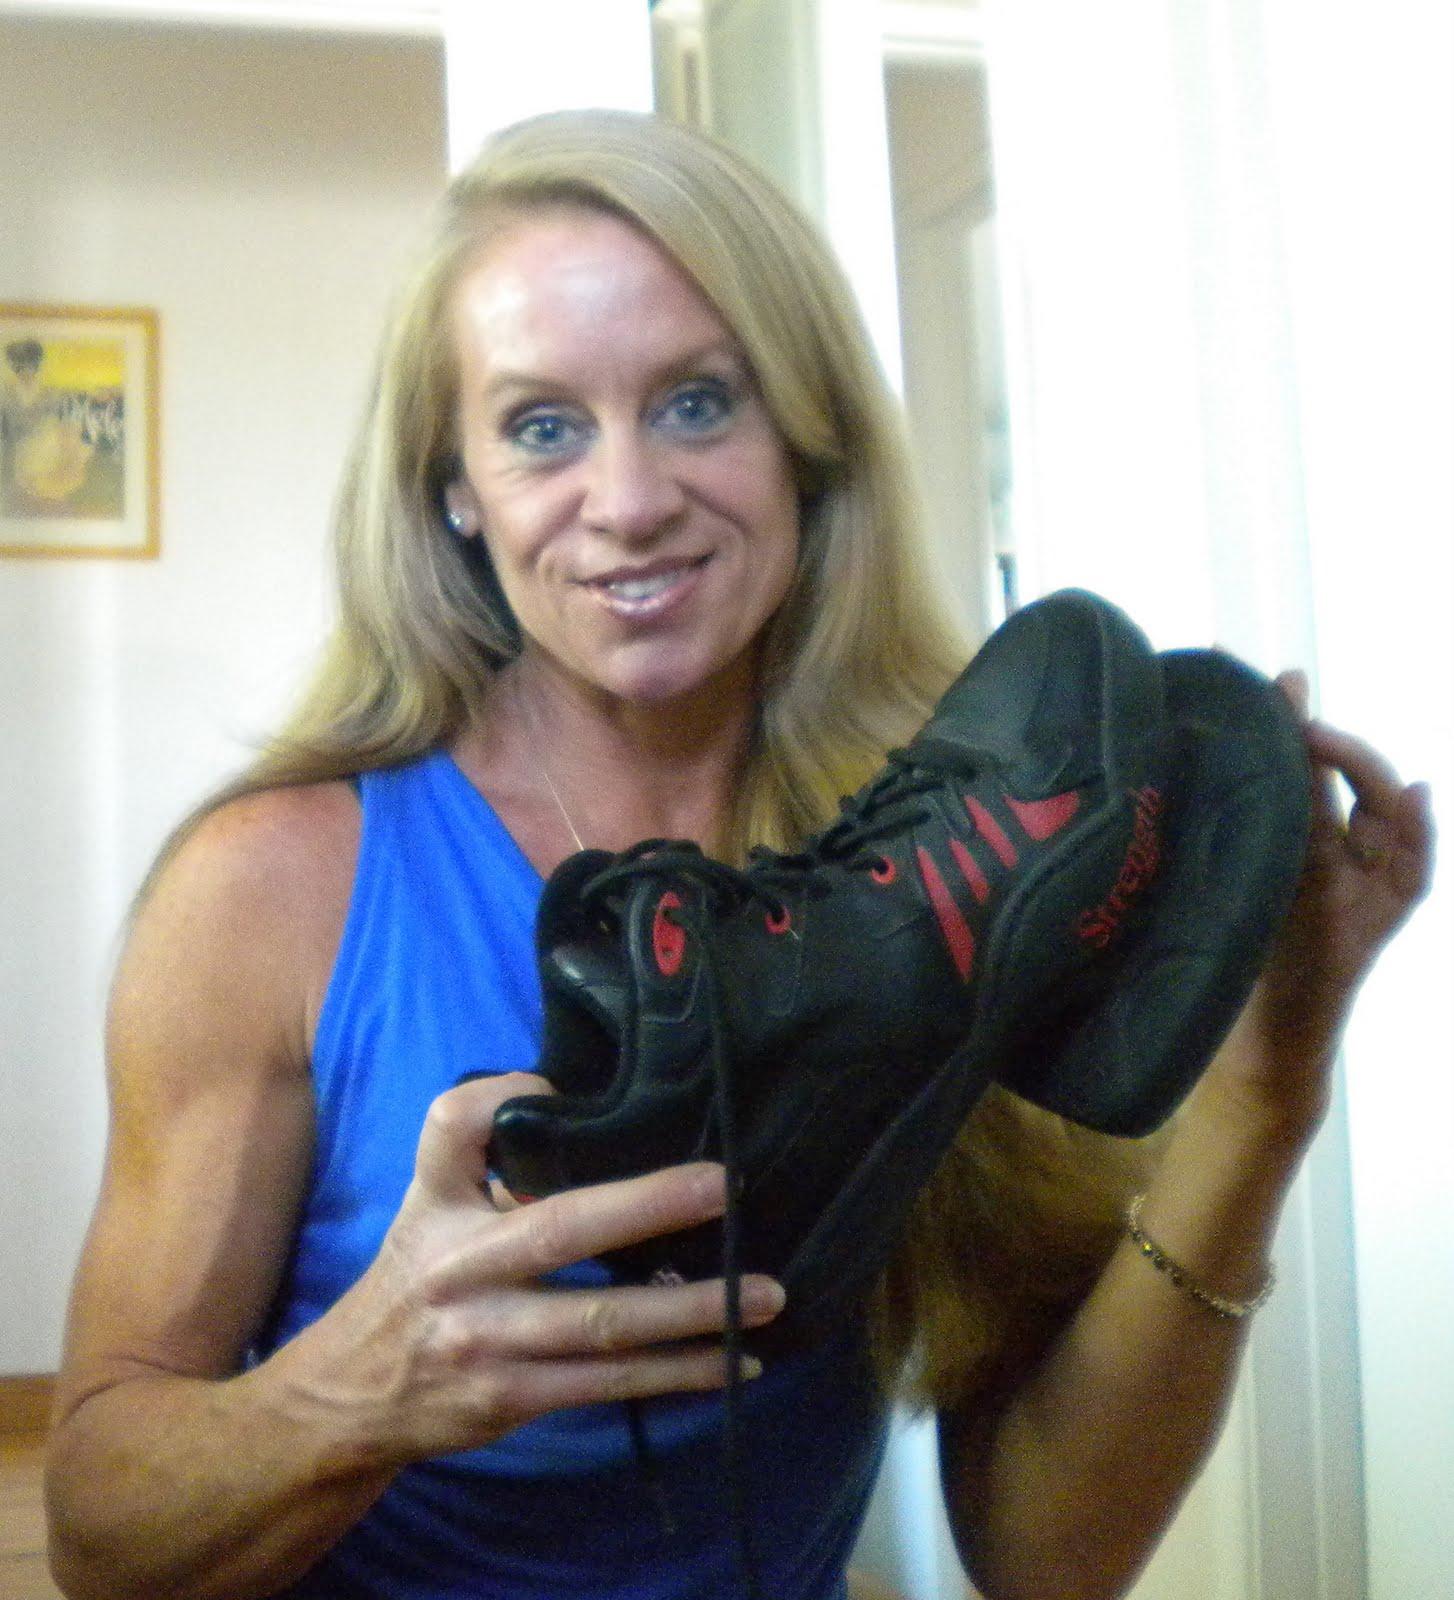 http://4.bp.blogspot.com/_NZ2Us8i0XkE/TBLkASh27sI/AAAAAAAAIvU/s9cM0vPlNbA/s1600/My%2BShoes.jpg